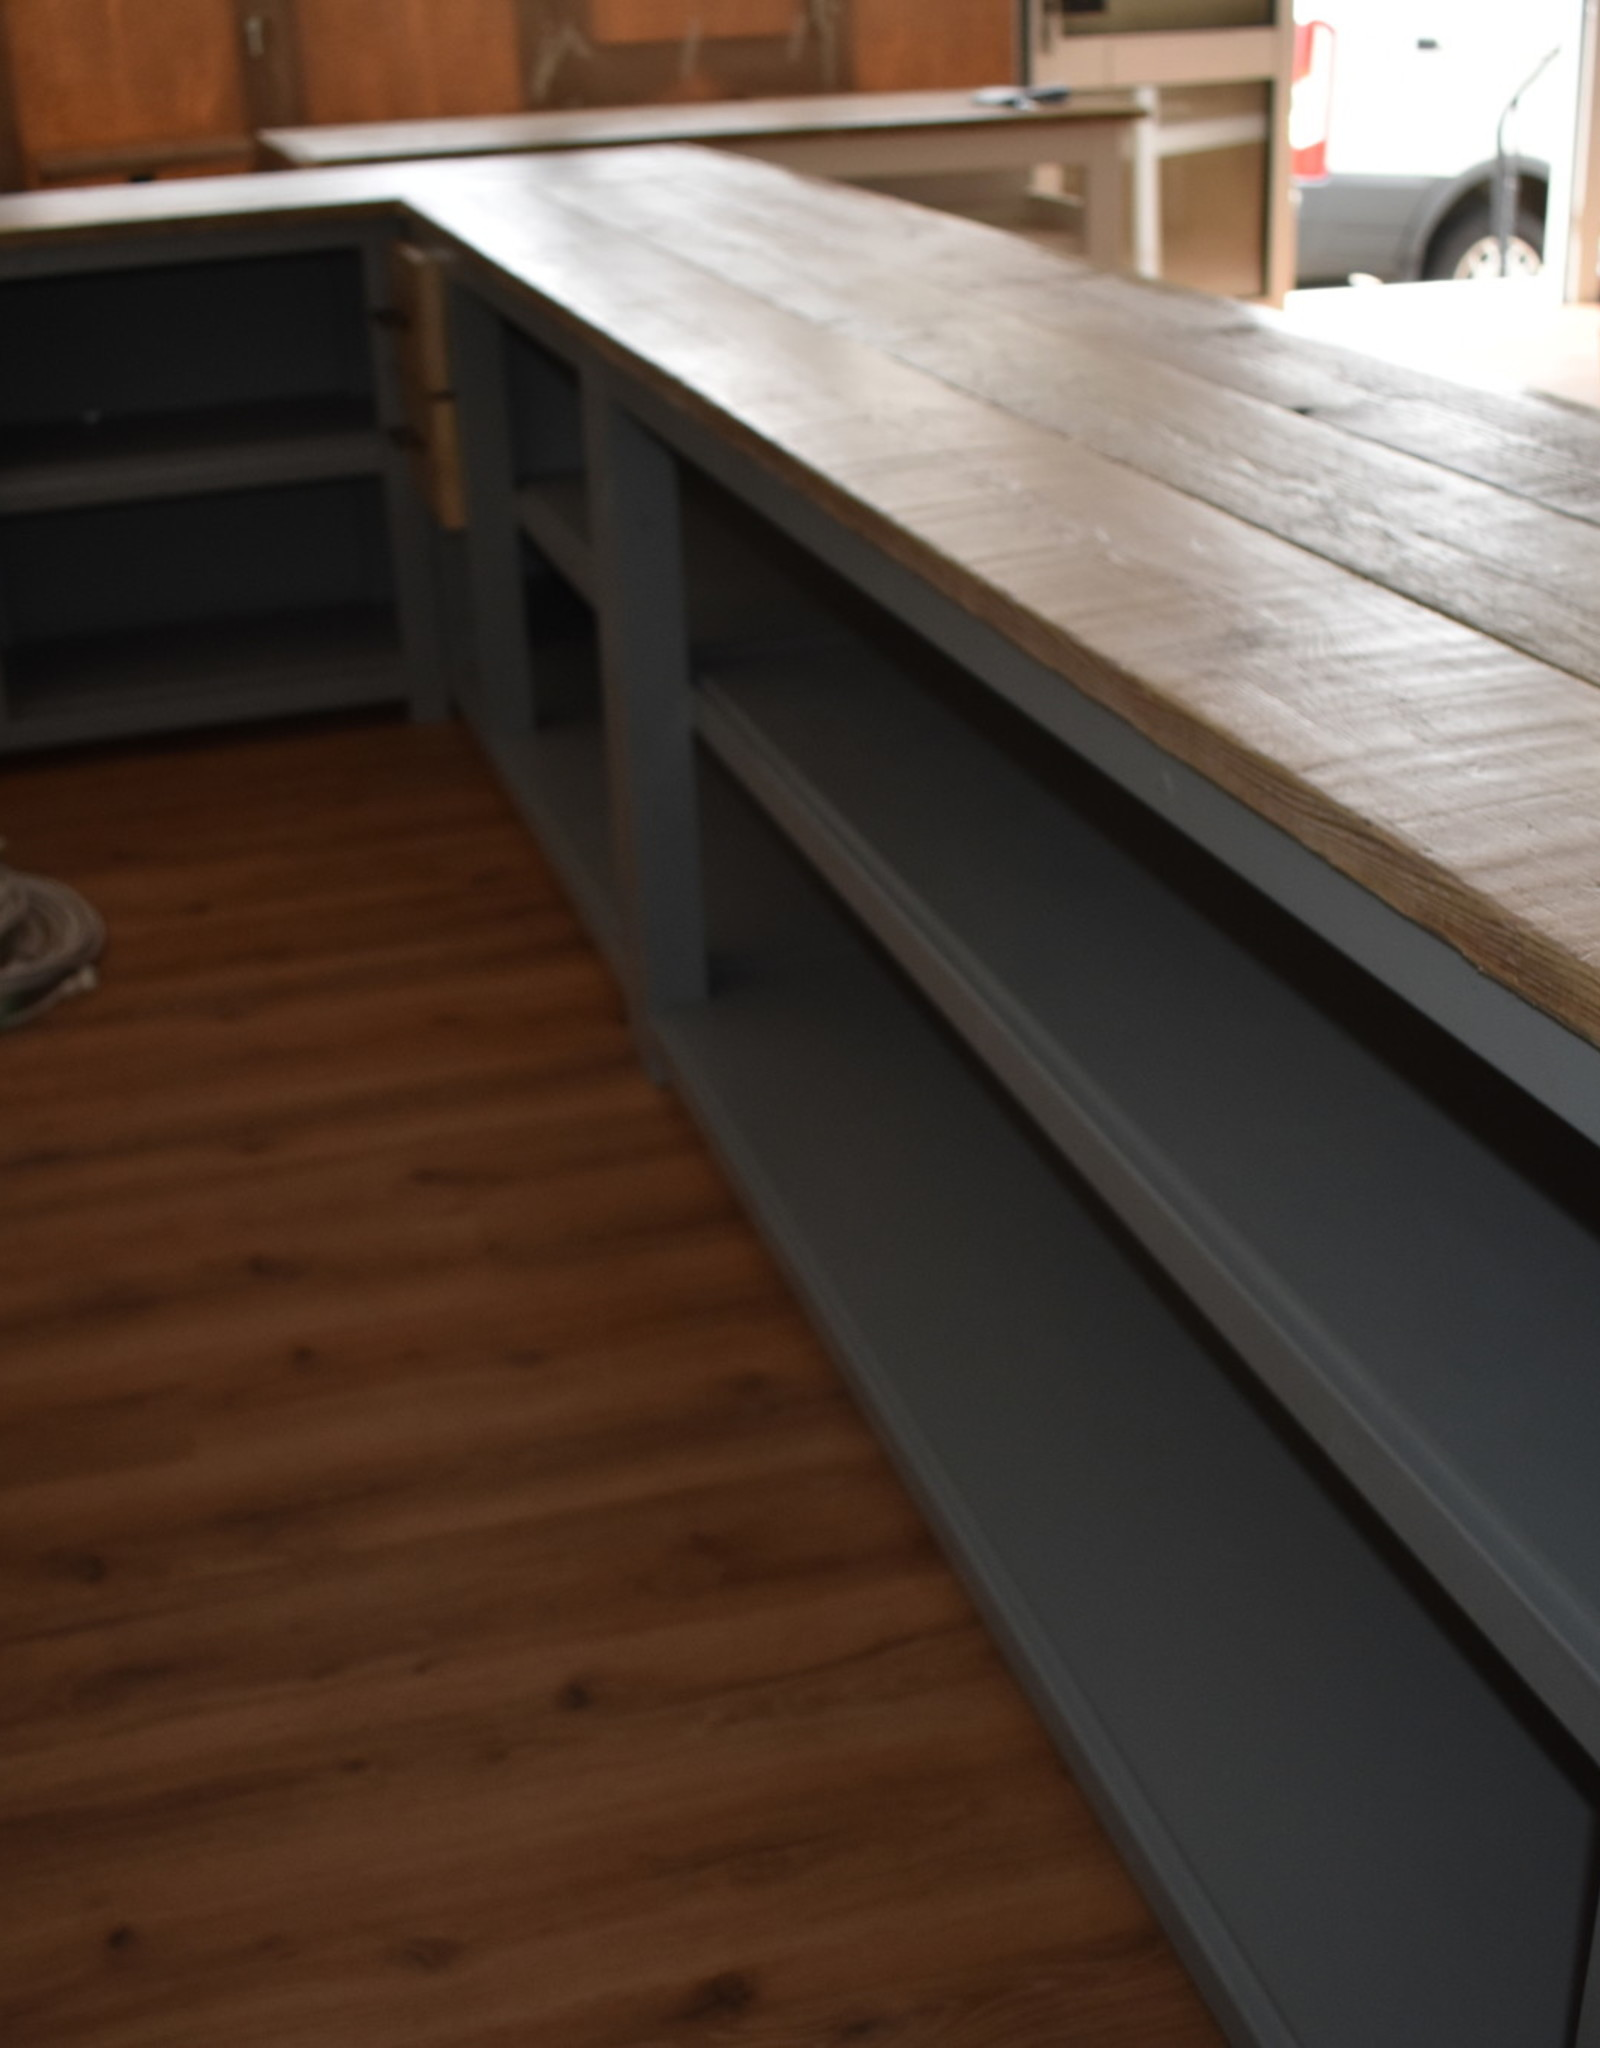 Hoek toonbank  / Bar / Ontvangstbalie met Vintage houten blad alle maten